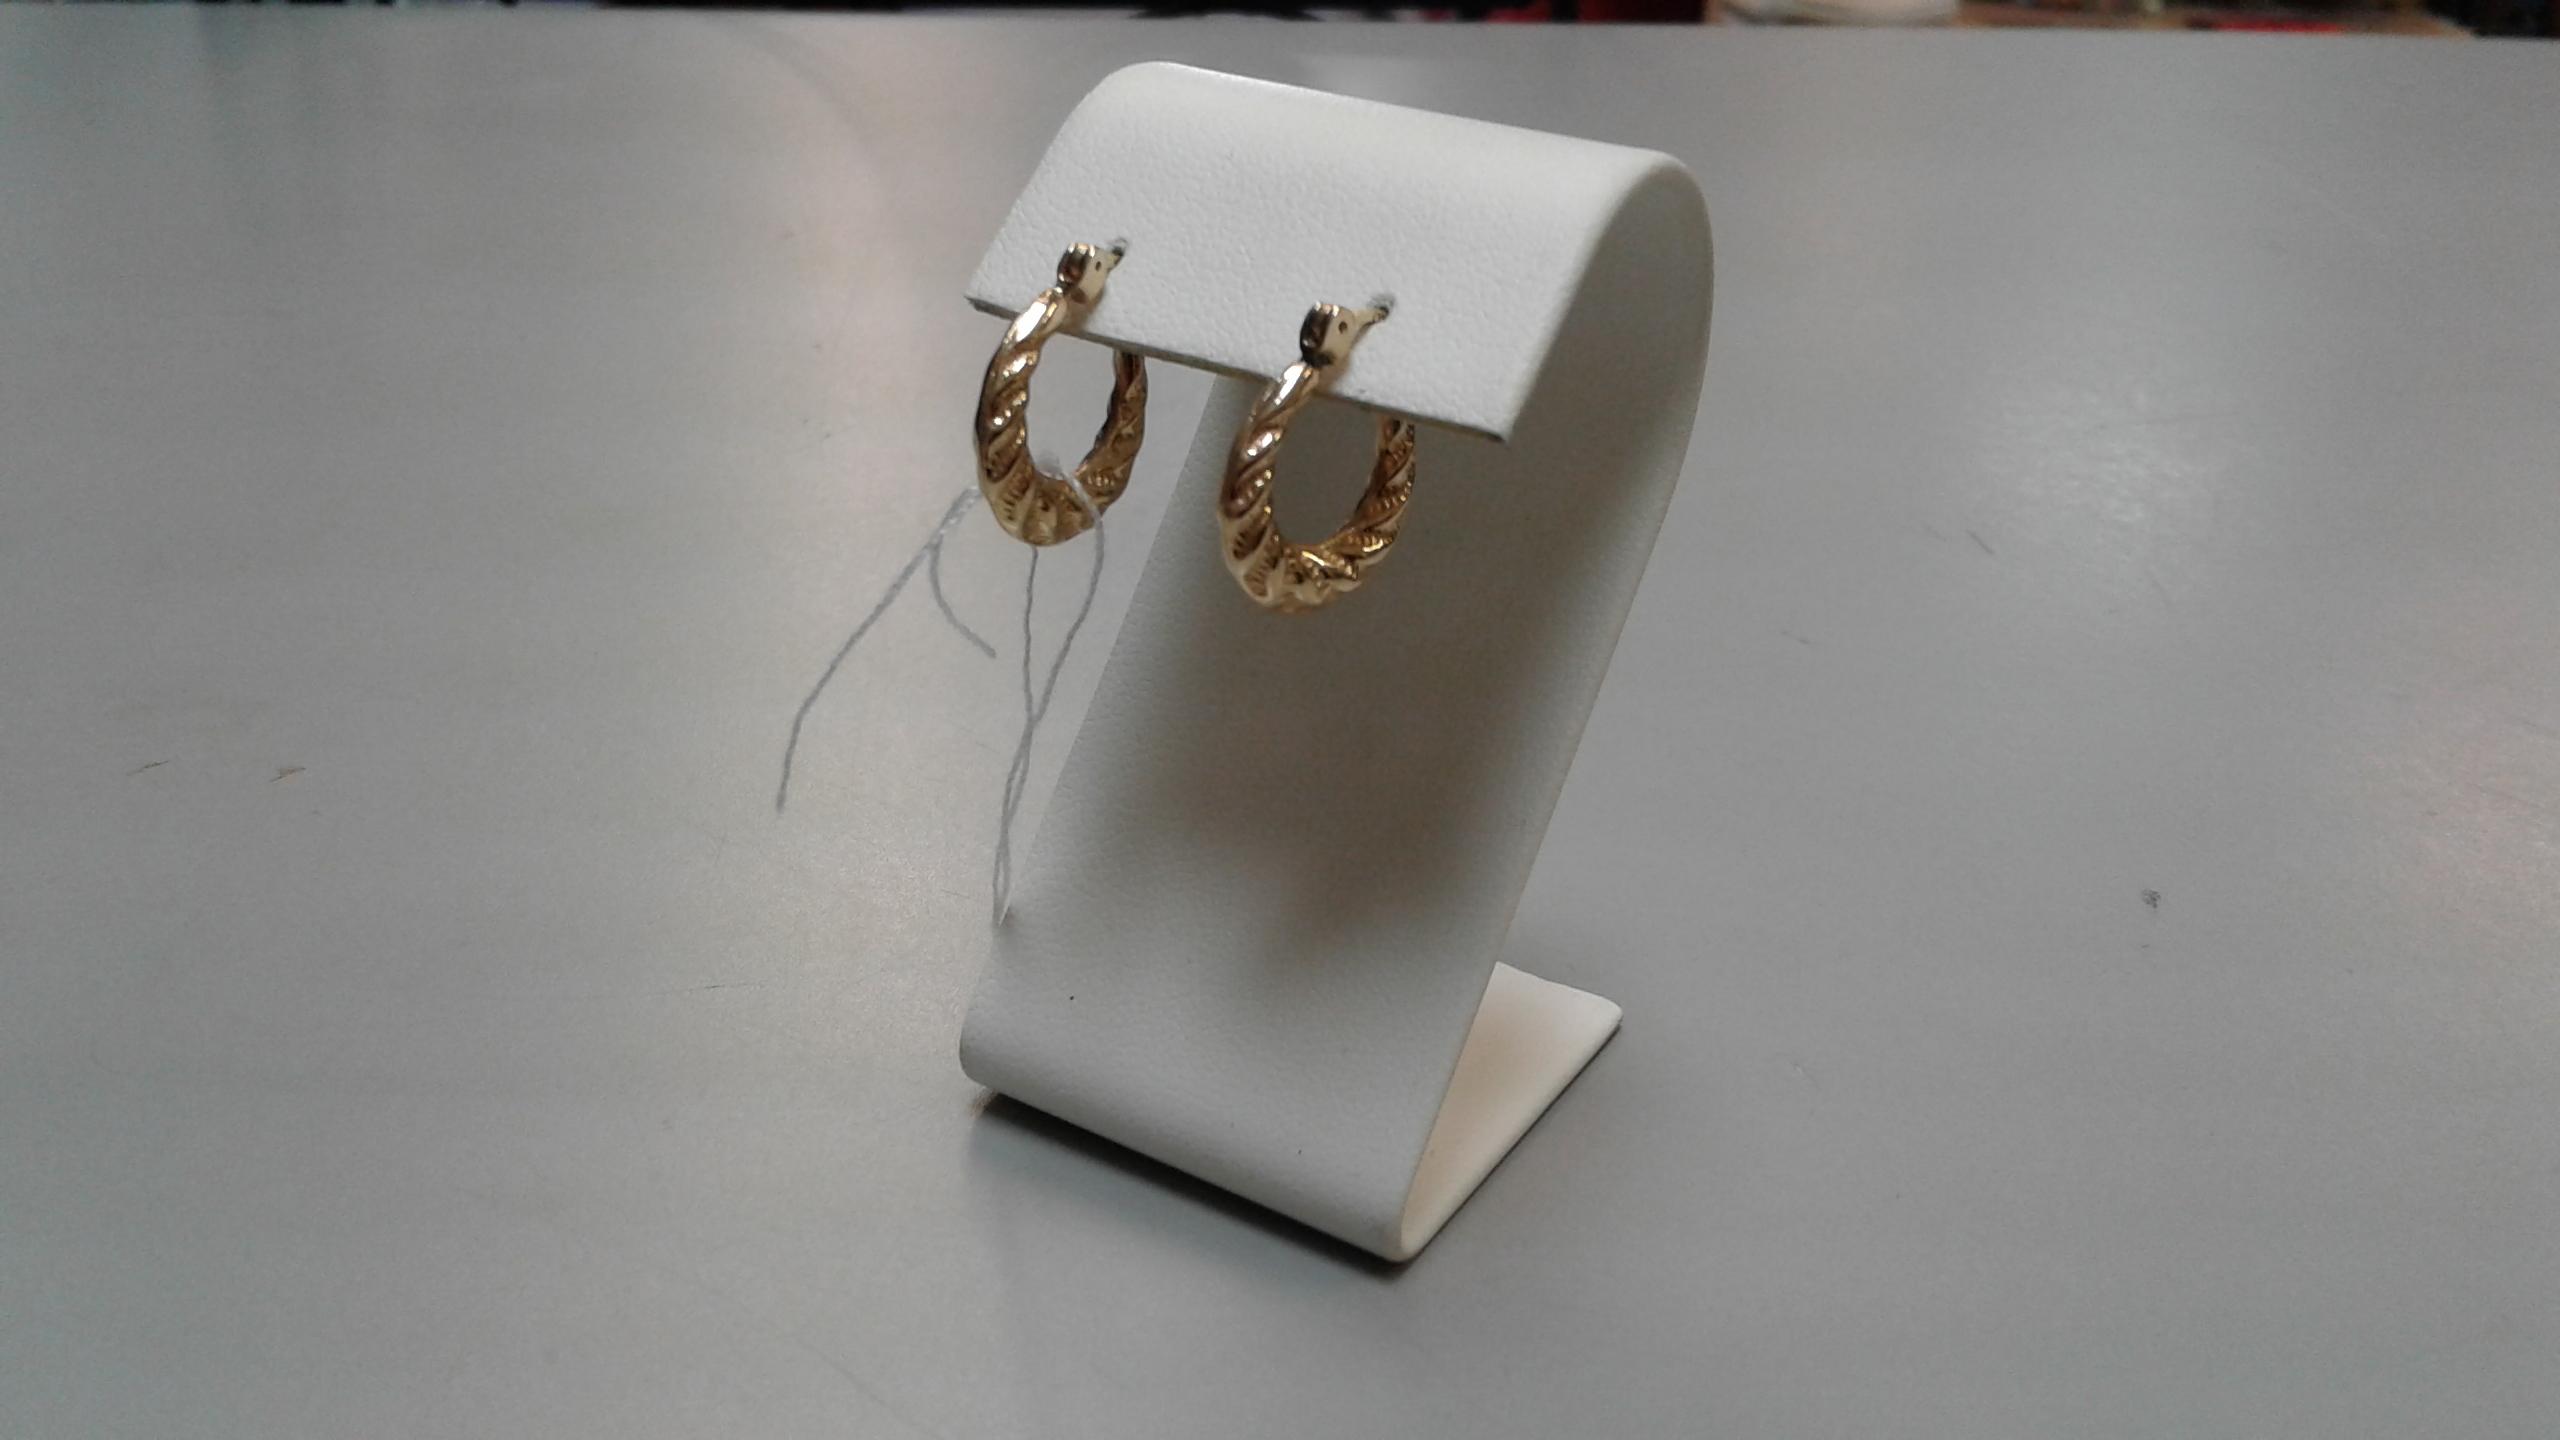 14KT - Yellow Gold - Hoop - Ear Rings -Jewelry - 1.5 Grams